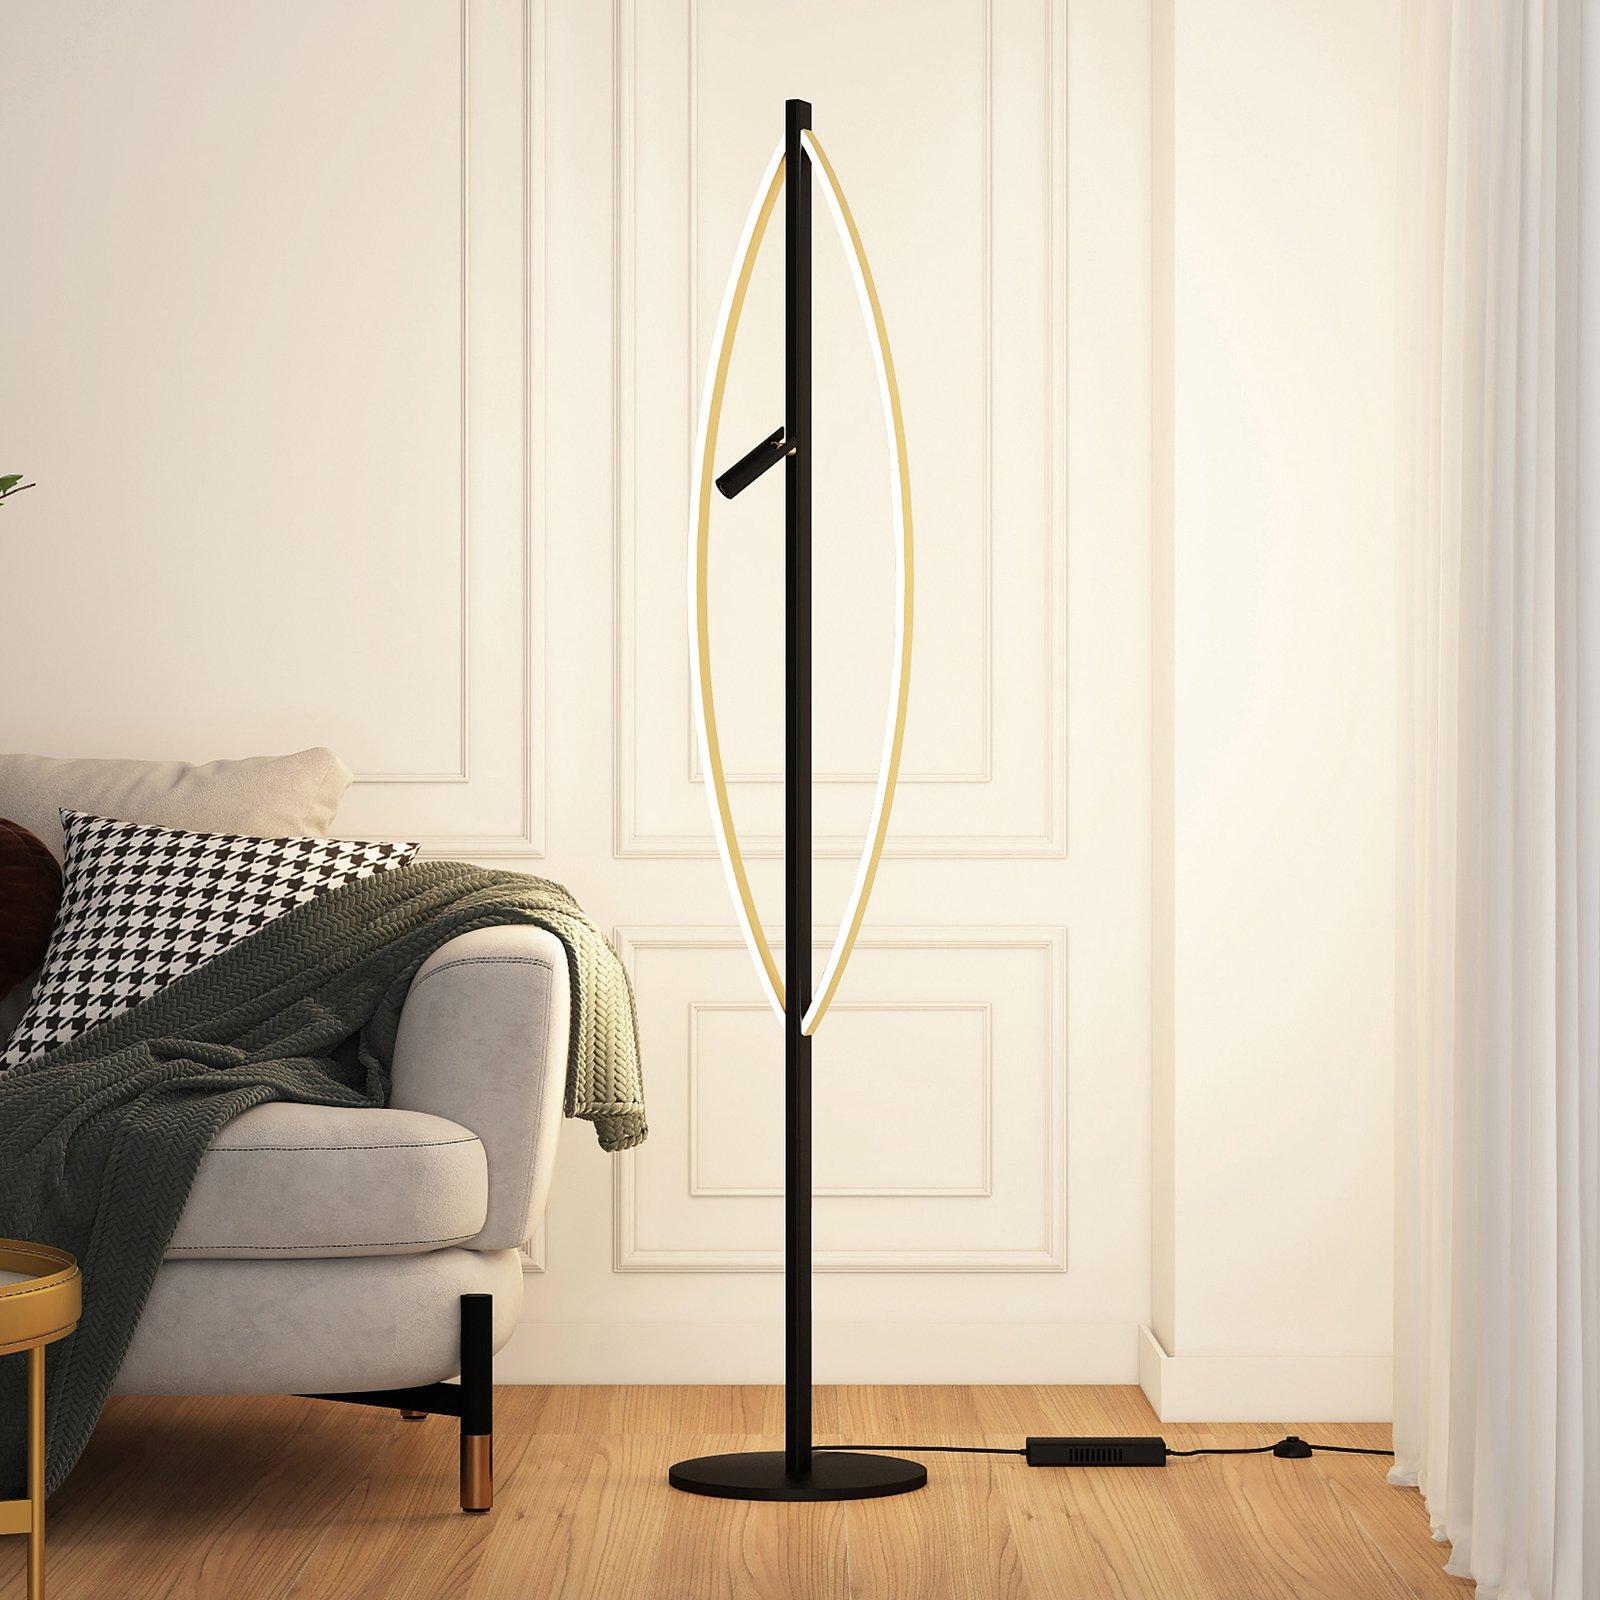 Lucande Matwei LED-gulvlampe, oval, messing